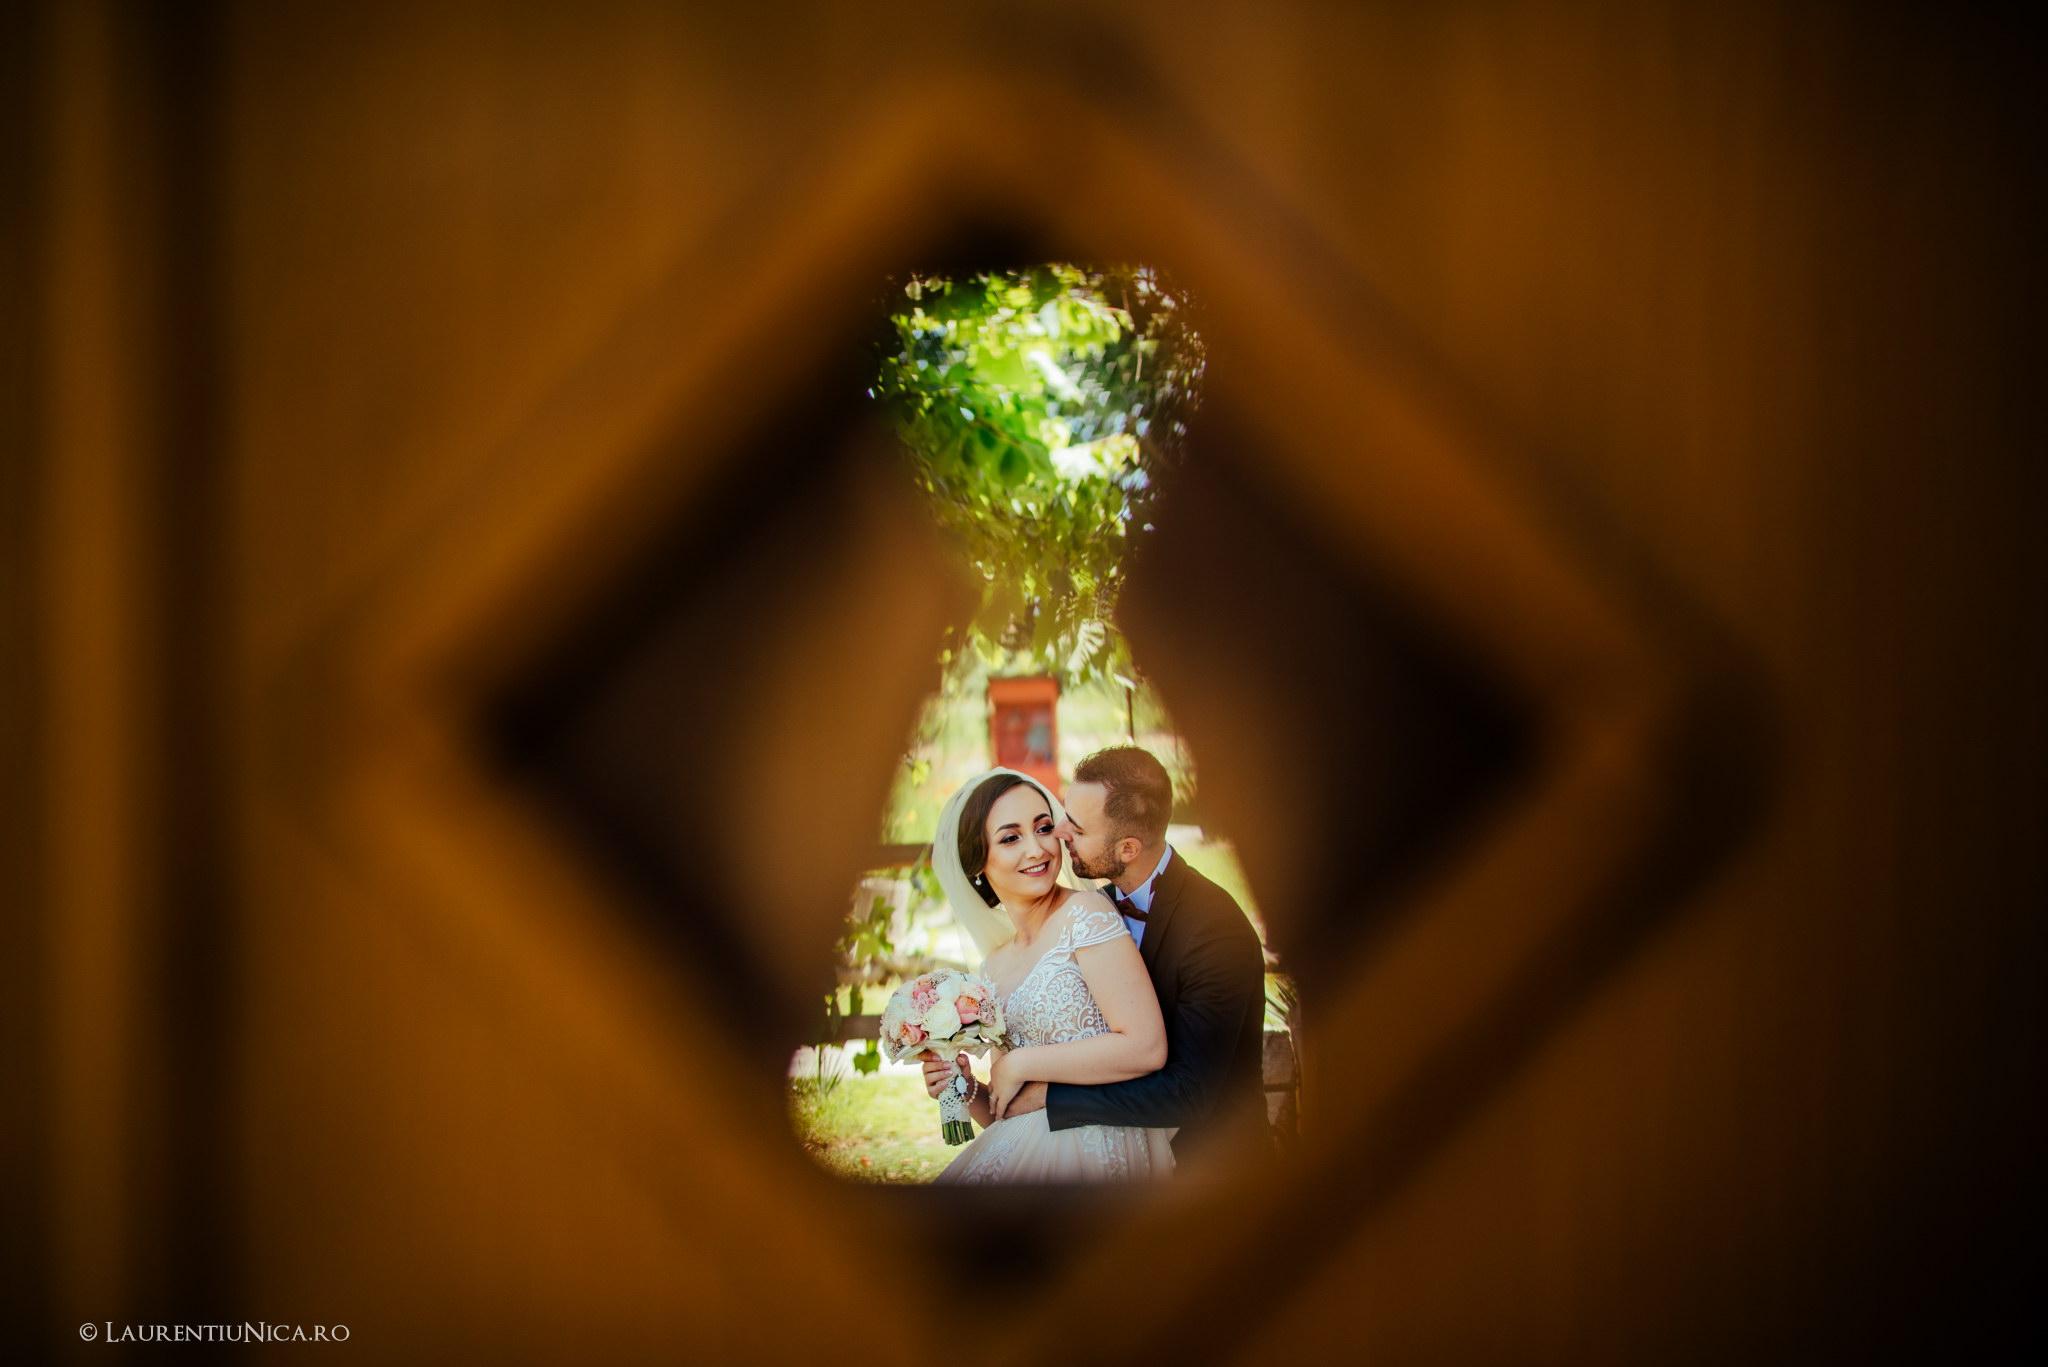 daiana si madalin fotograf nunta laurentiu nica targu jiu gorj 17 - Daiana & Madalin | Fotografii nunta | Targu-Jiu | Gorj